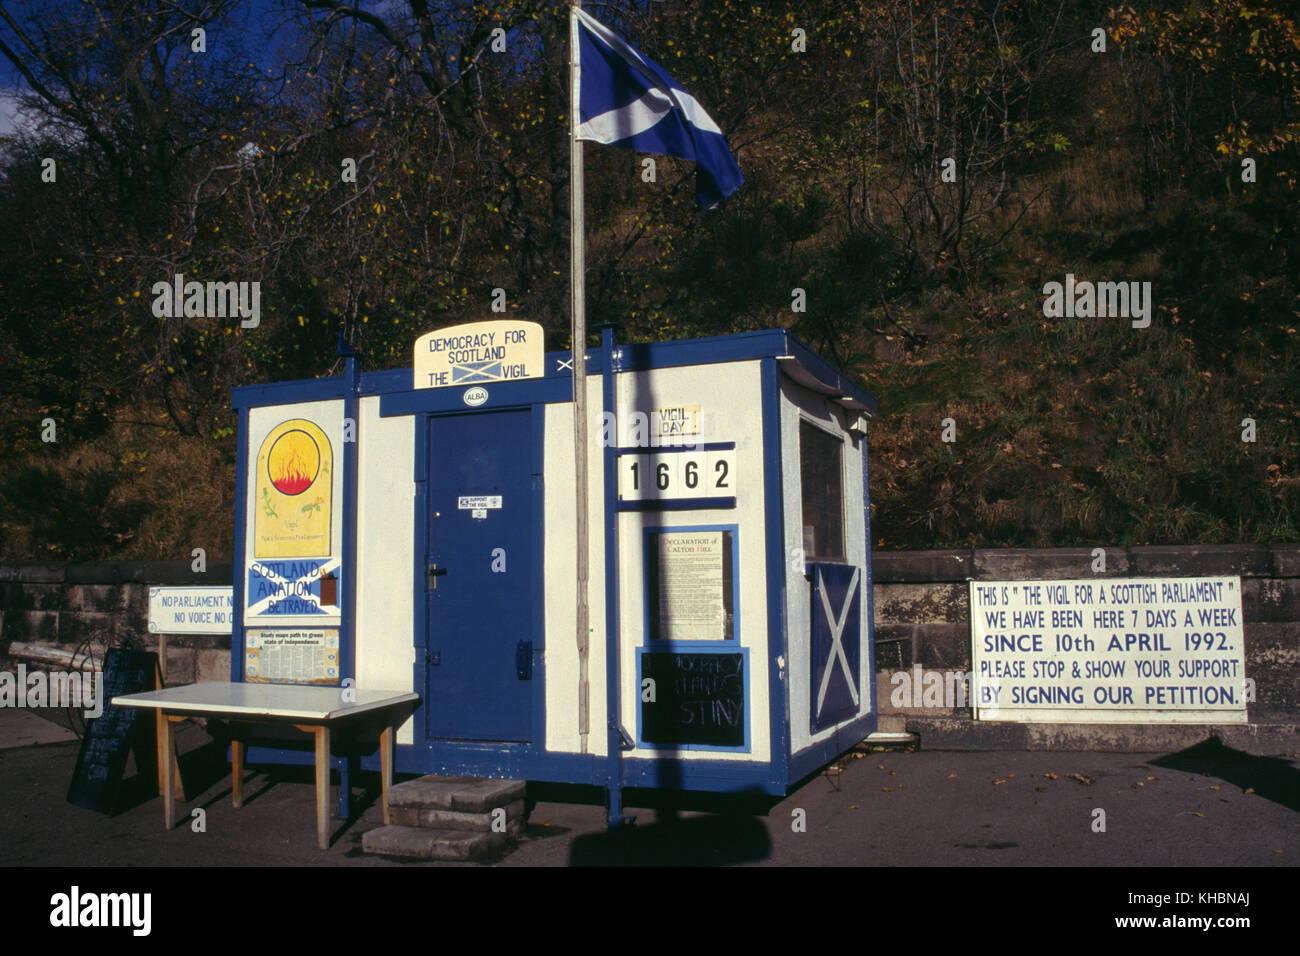 Vigil for a Scottish parliament 1996, Edinburgh - Stock Image